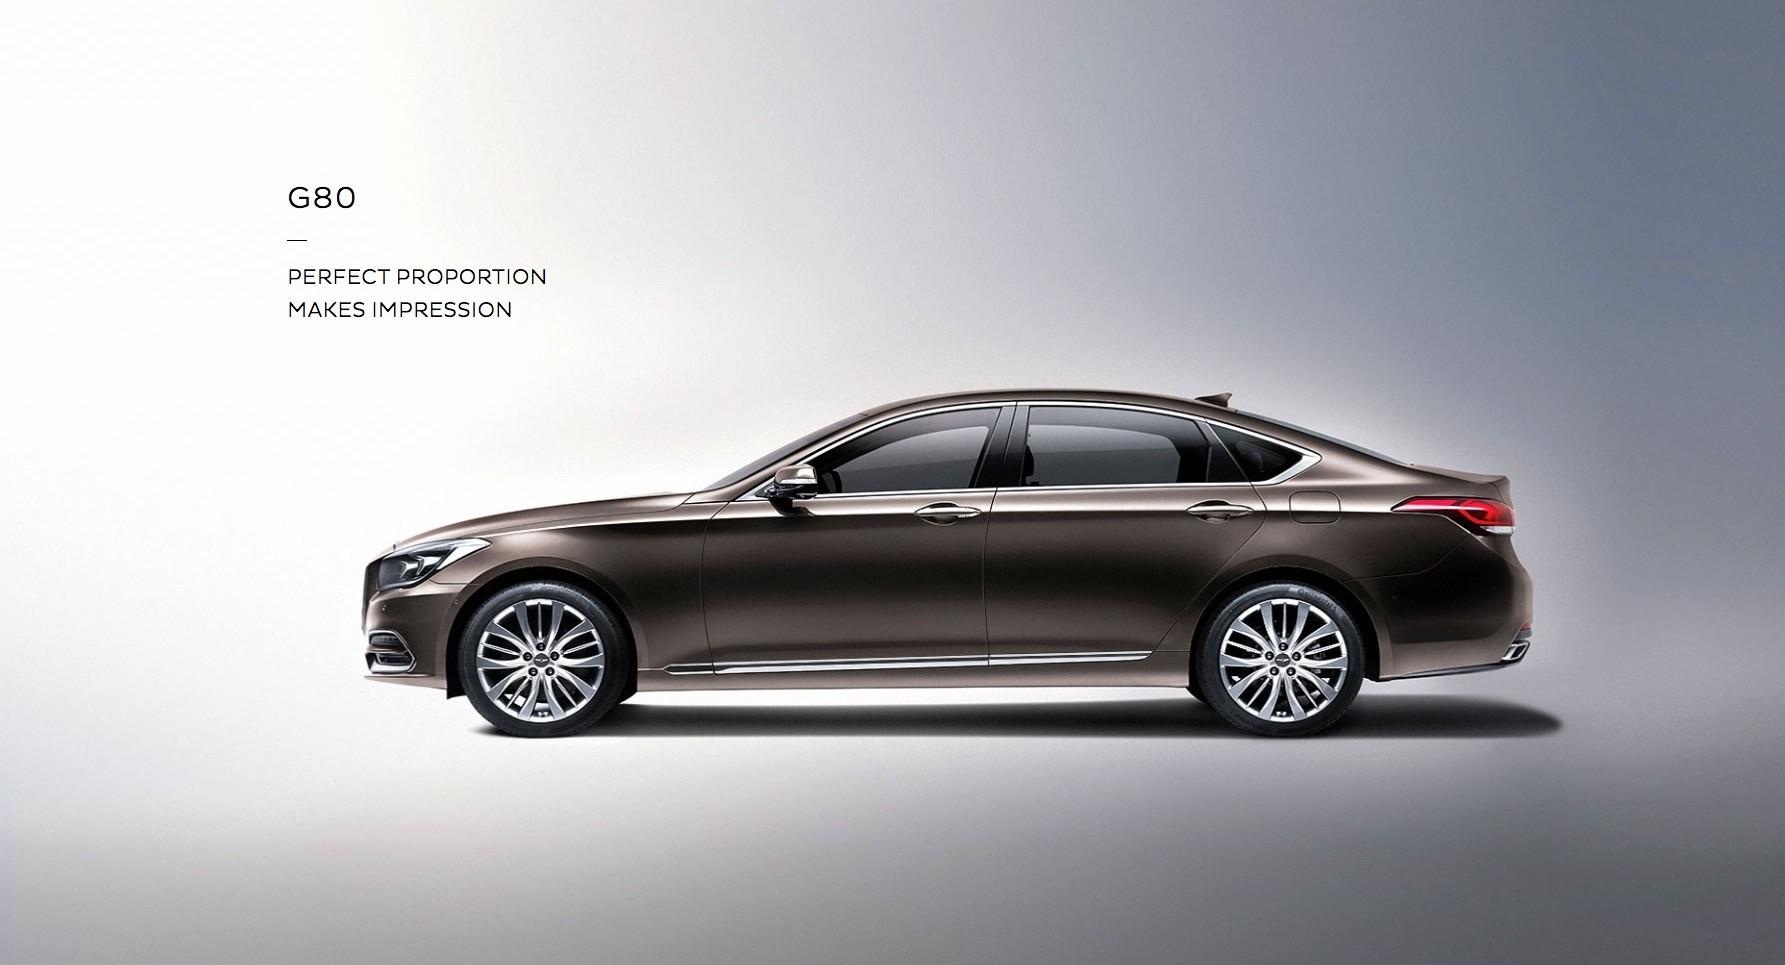 Hyundai Rm16 >> 2017 Genesis G80 Unveiled at 2016 Busan Auto Show ...